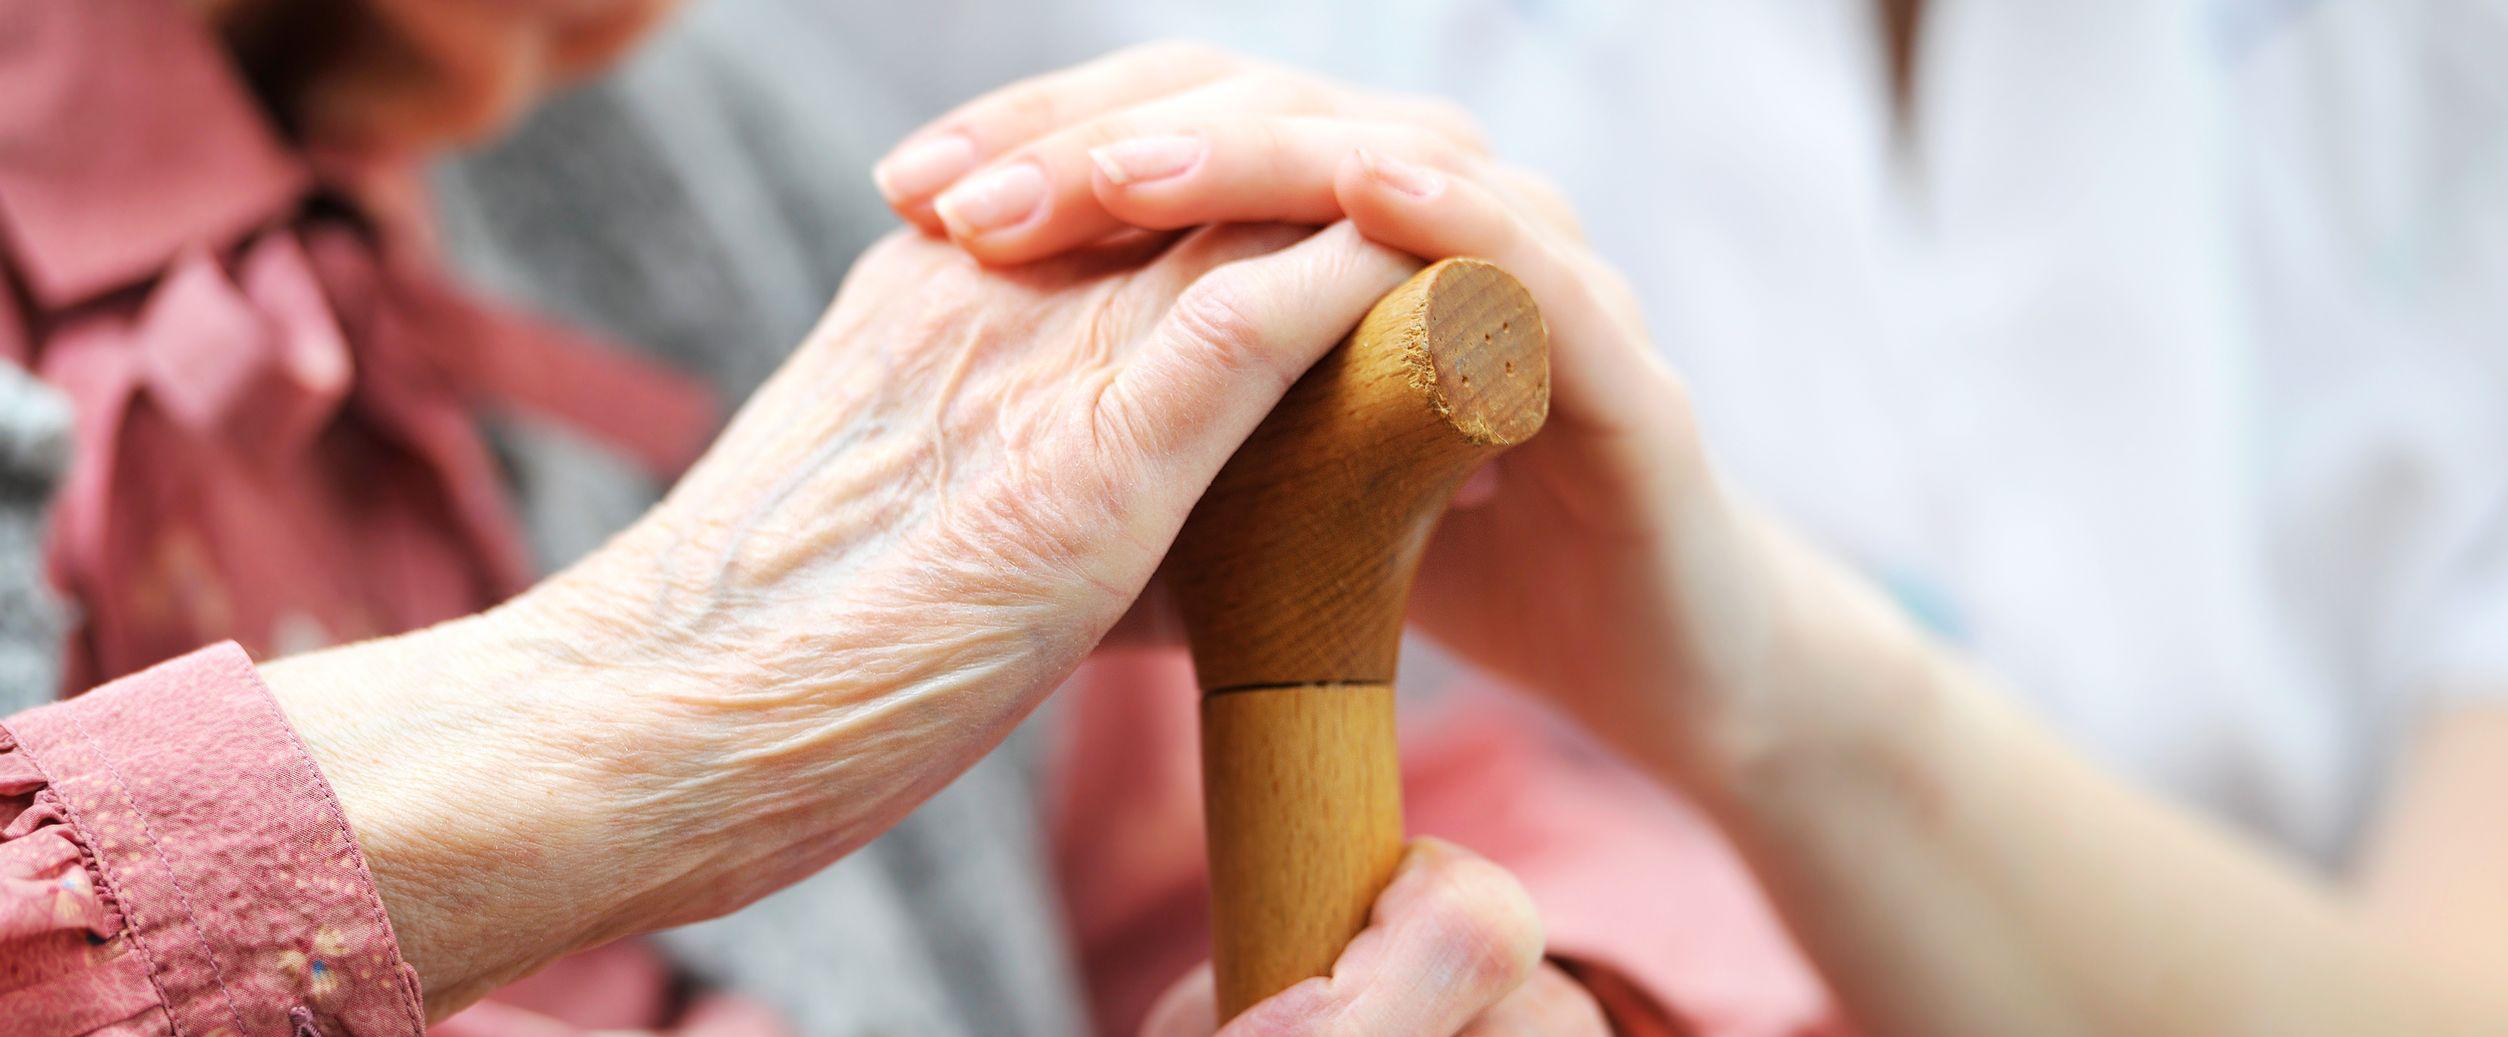 Senior-Care-In-Home-Services-Tacoma-Seattle-Everett